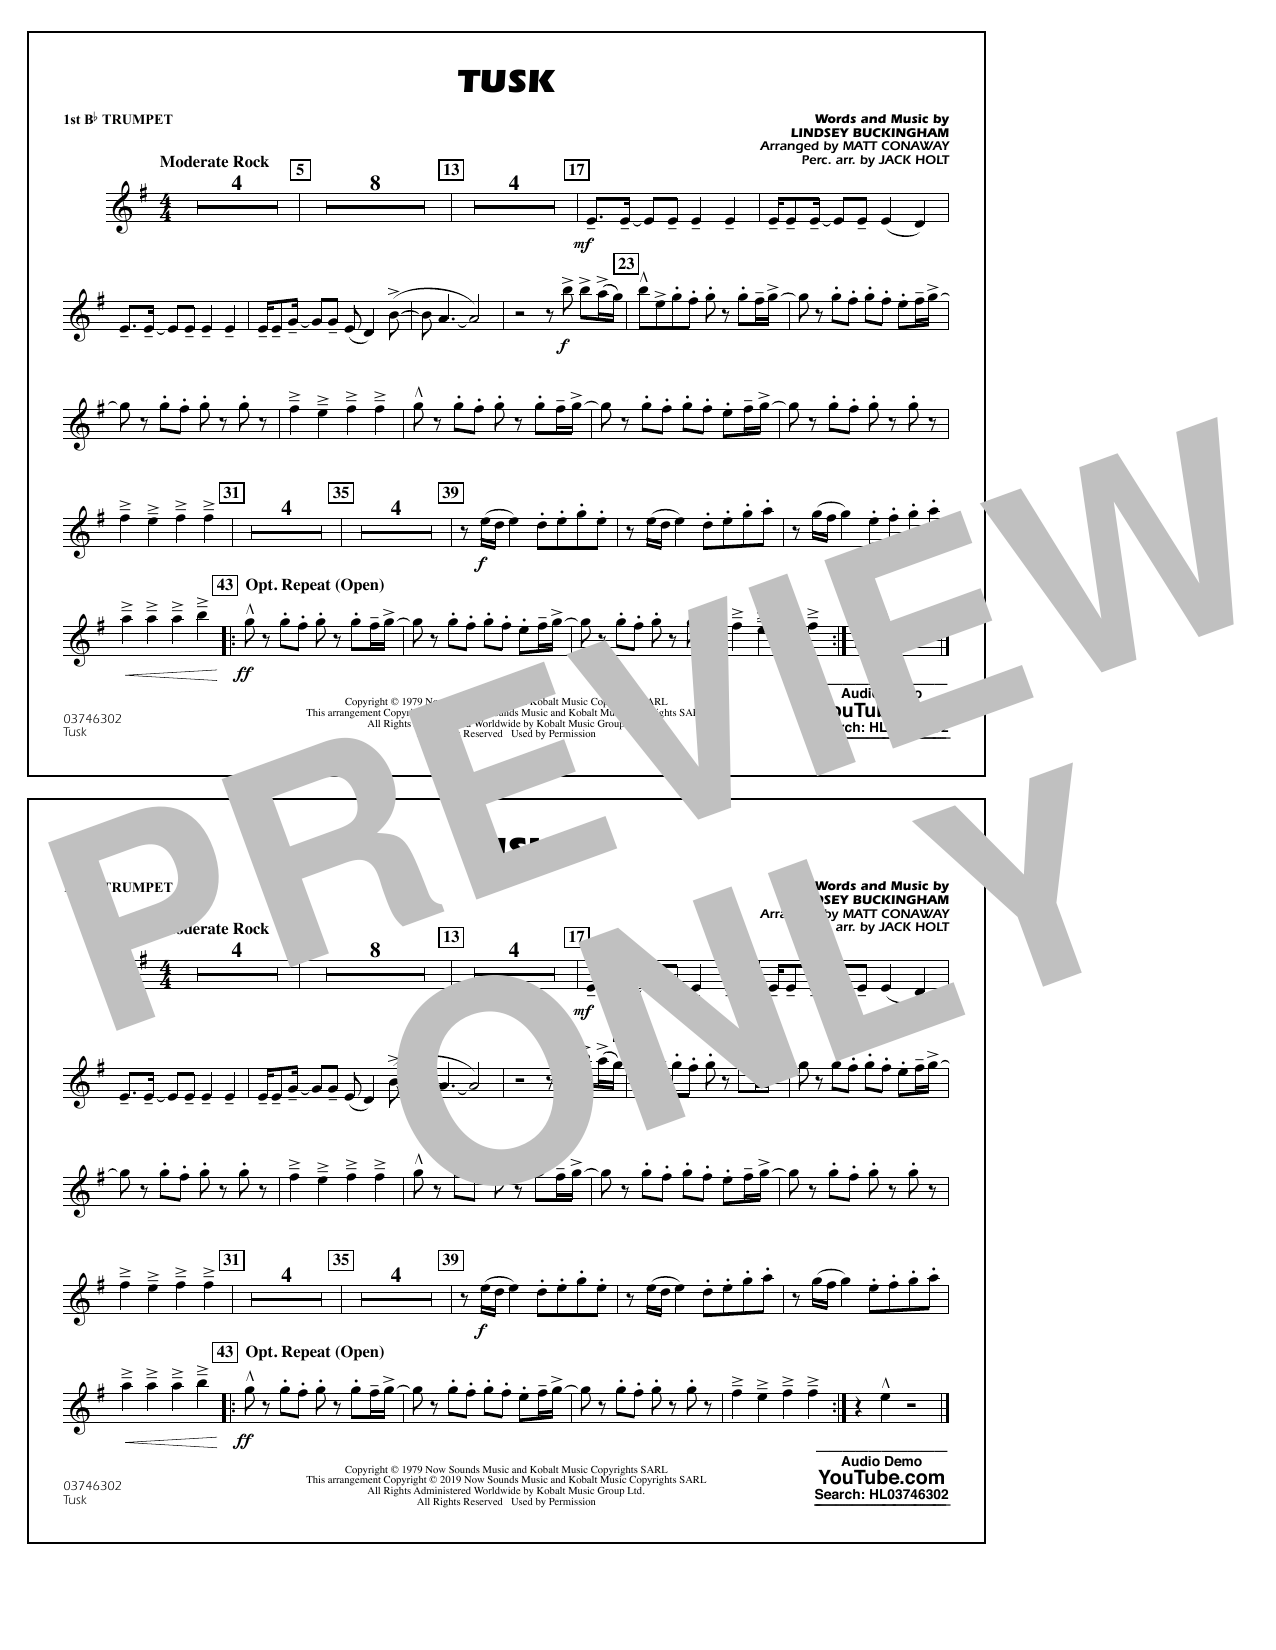 Tusk (arr. Matt Conaway) - 1st Bb Trumpet (Marching Band)